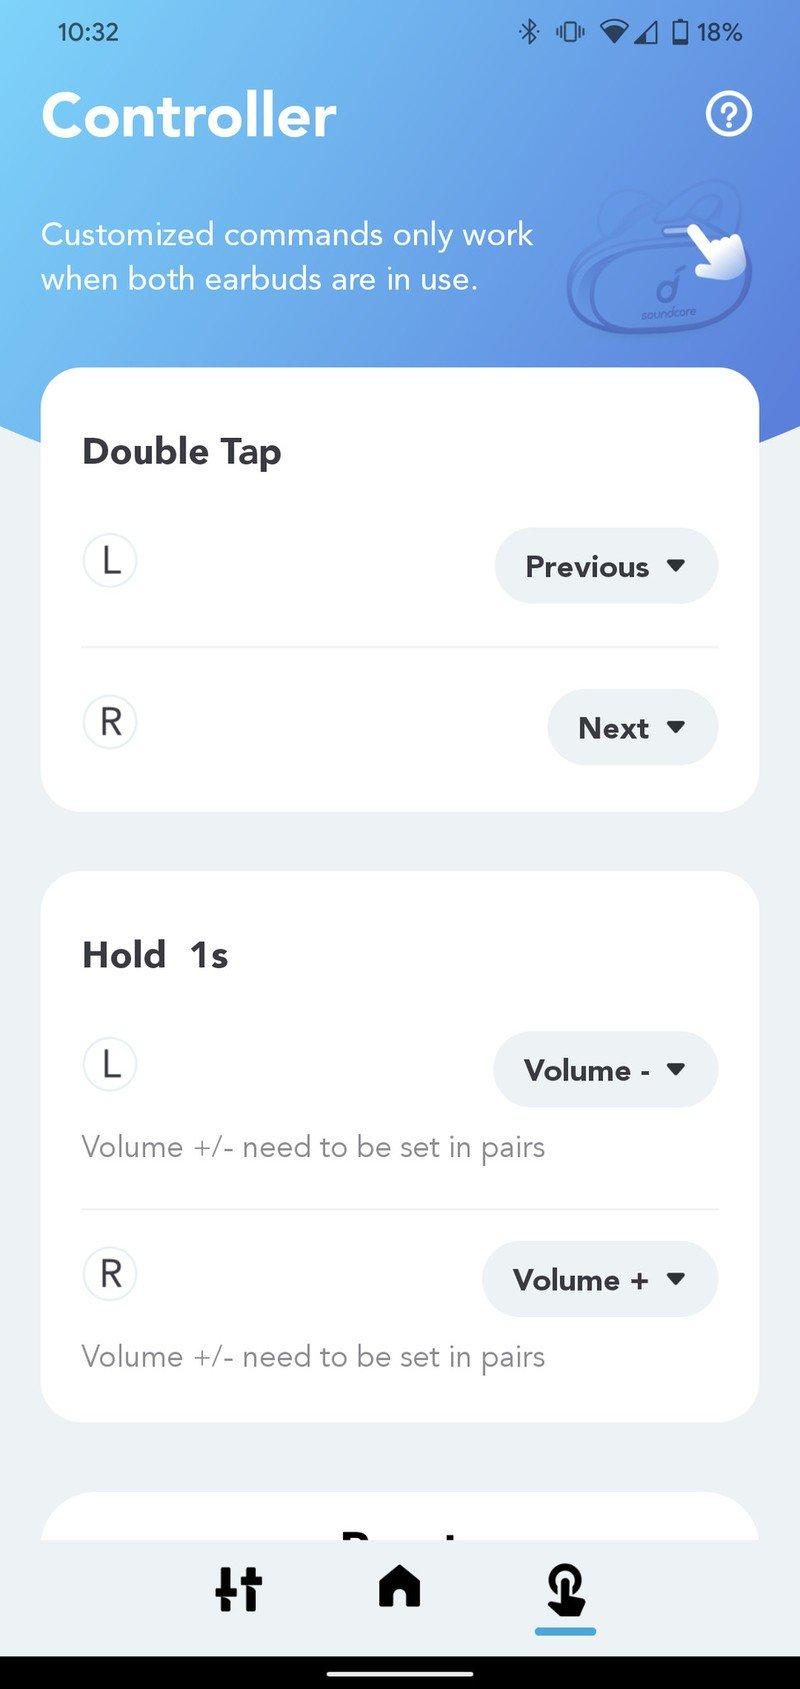 soundcore-app-2.jpg?itok=T5zWPtEz